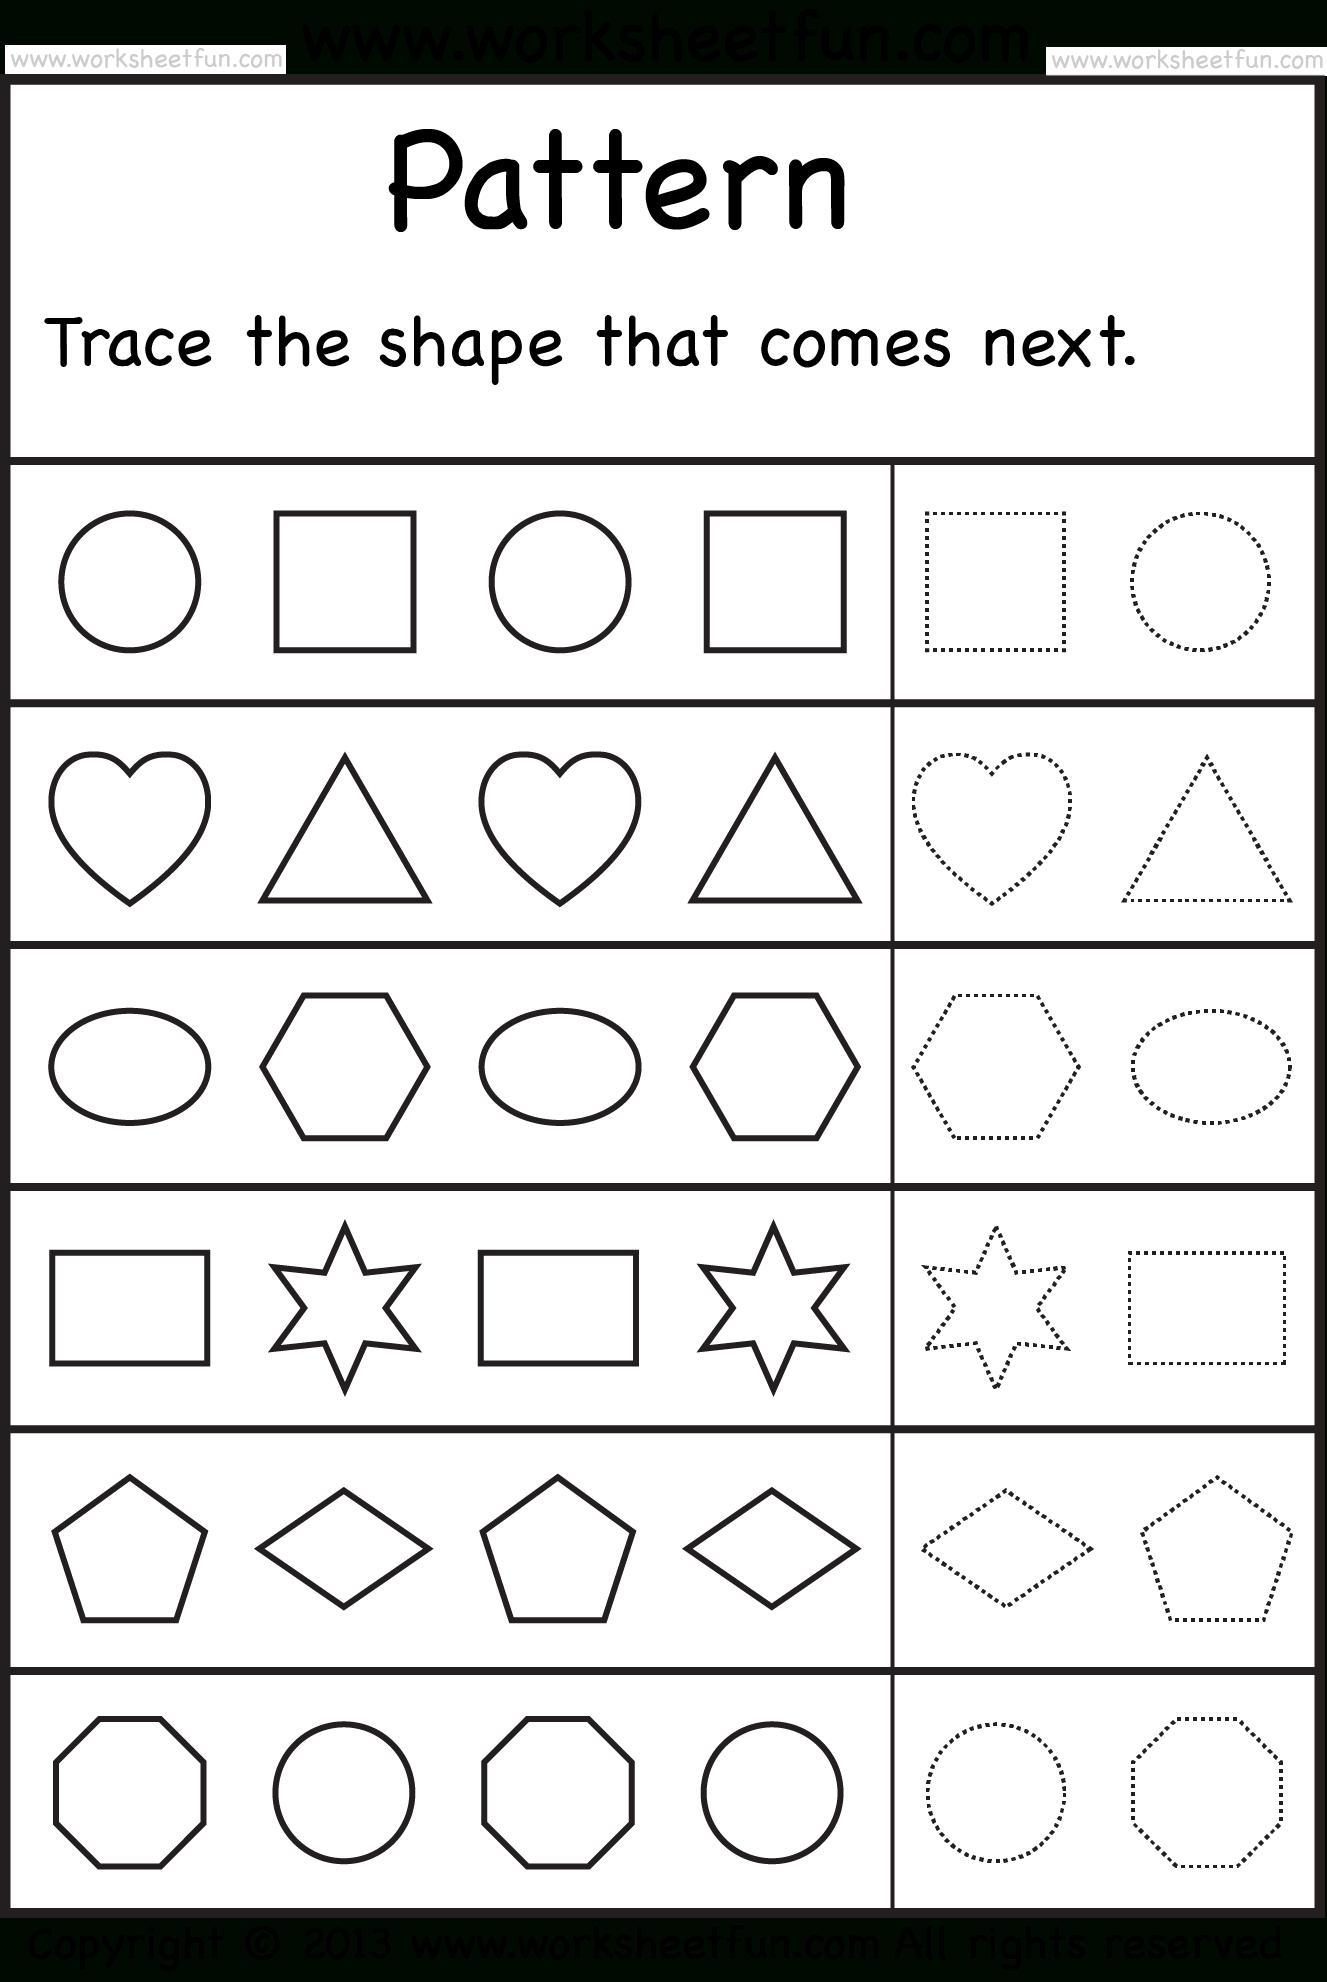 Free Printable Preschool Worksheets | Arts And Crafts | Kindergarten - Free Printable Preschool Worksheets